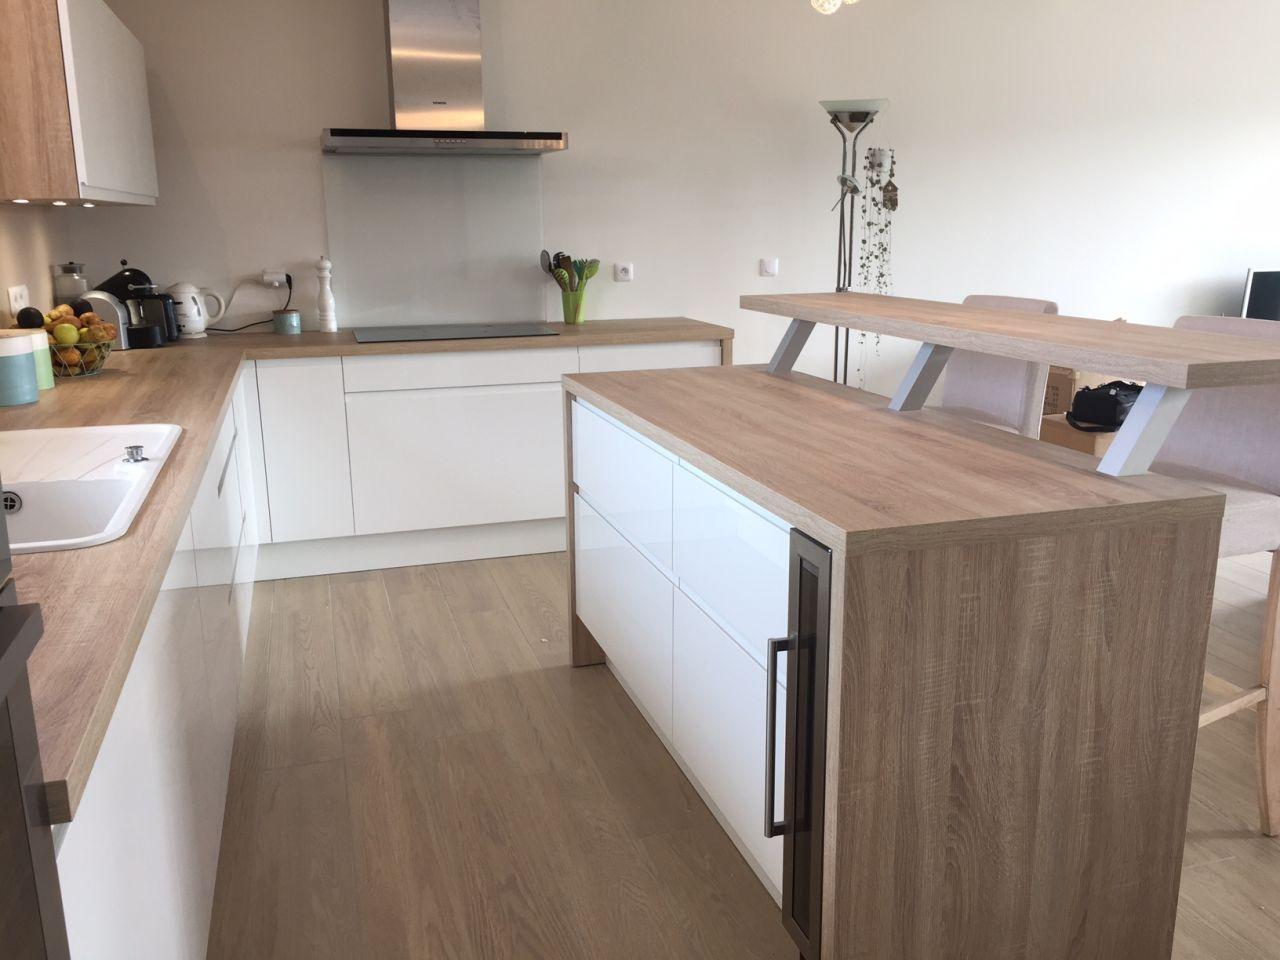 Cuisine socooc finition piky et chene bardolino kuchenne inspiracje kitchen interior - So cooc cuisine ...